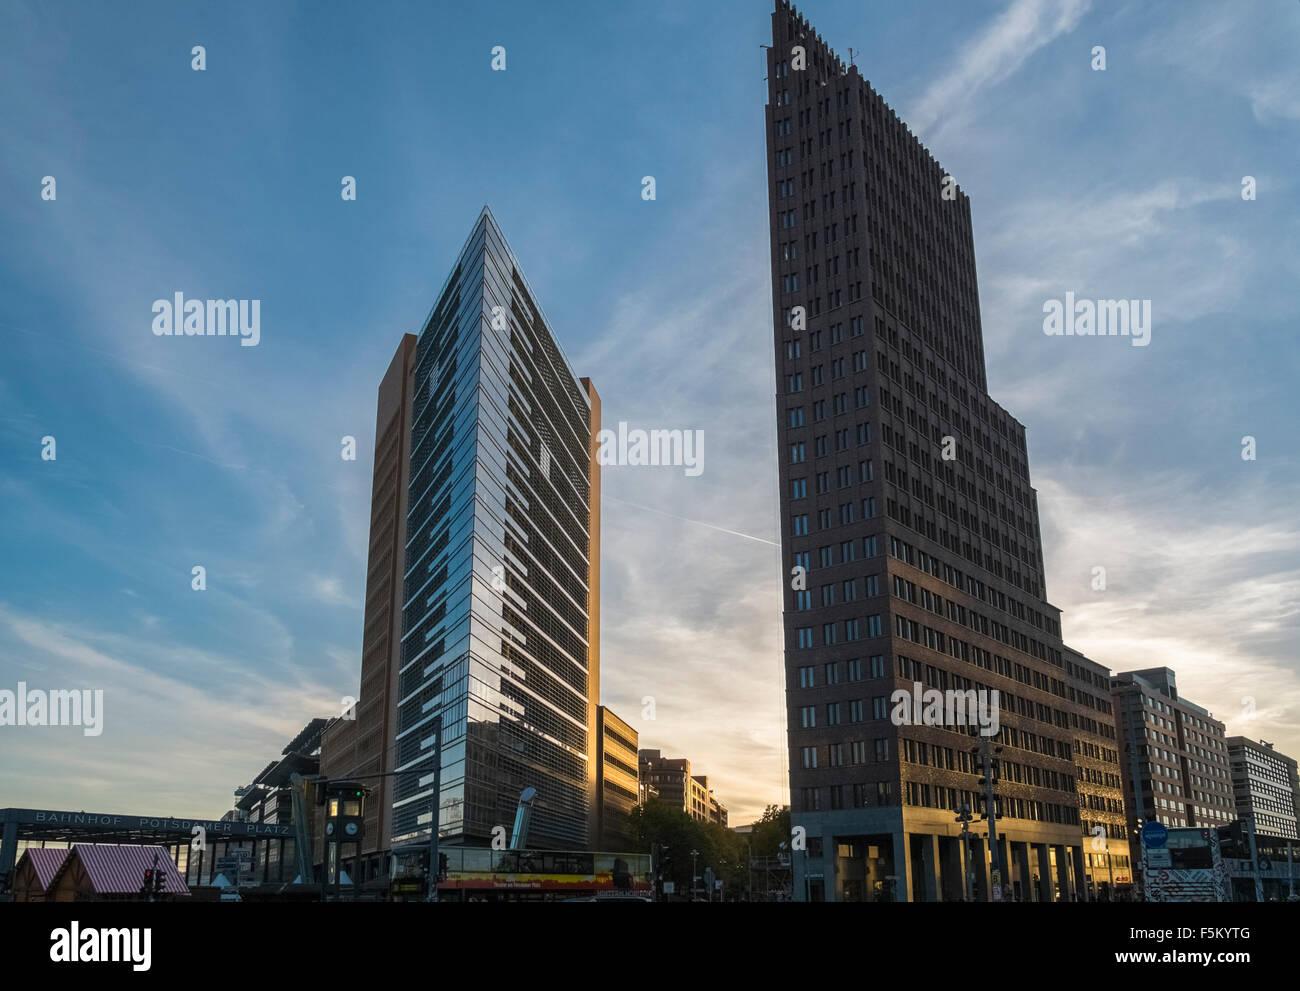 Modern architecture of PWC andf Kollhoff Tower buildings, Potsdamer Platz, Mitte, Berlin, Germany. - Stock Image